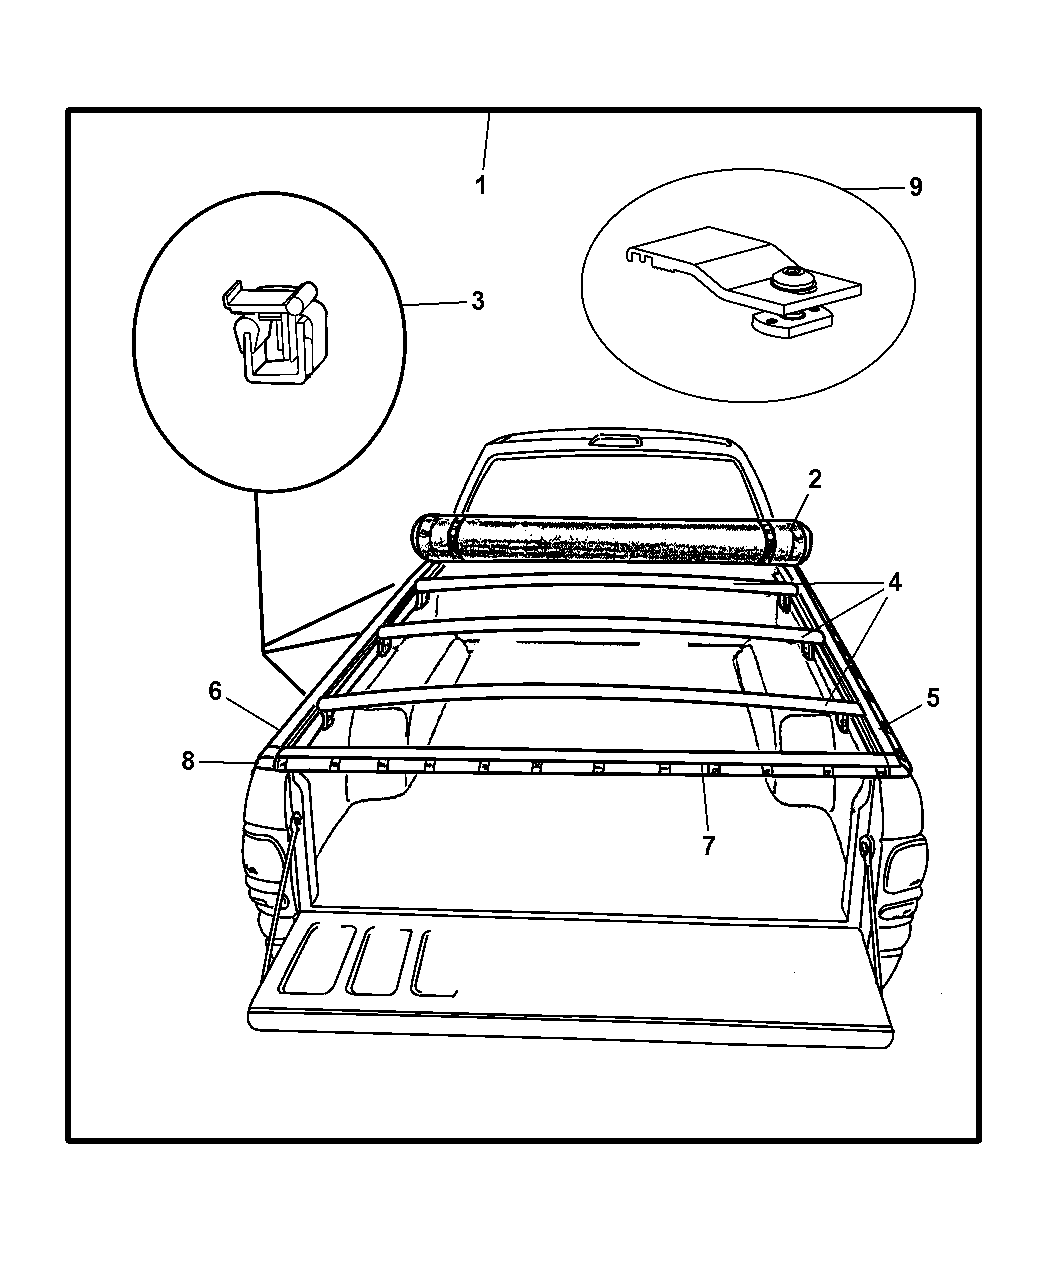 Genuine Dodge CLAMP-TONNEAU